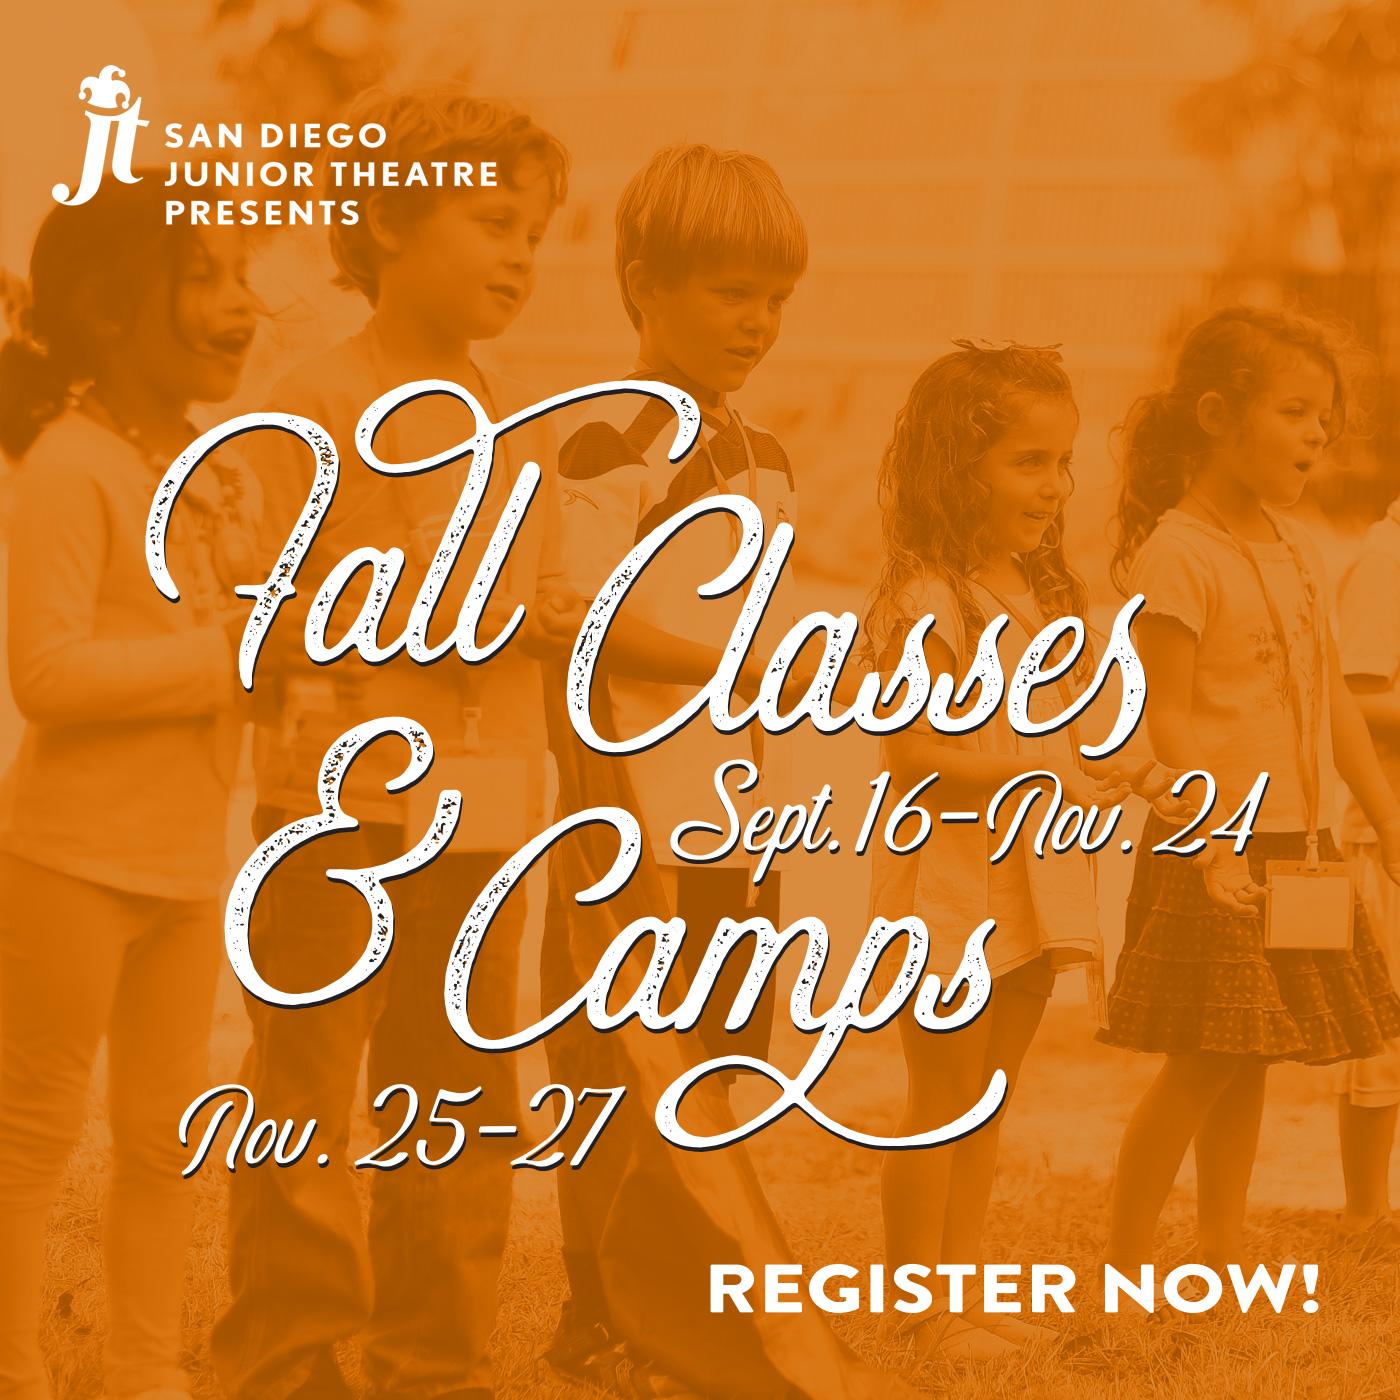 Fall Classes & Camps